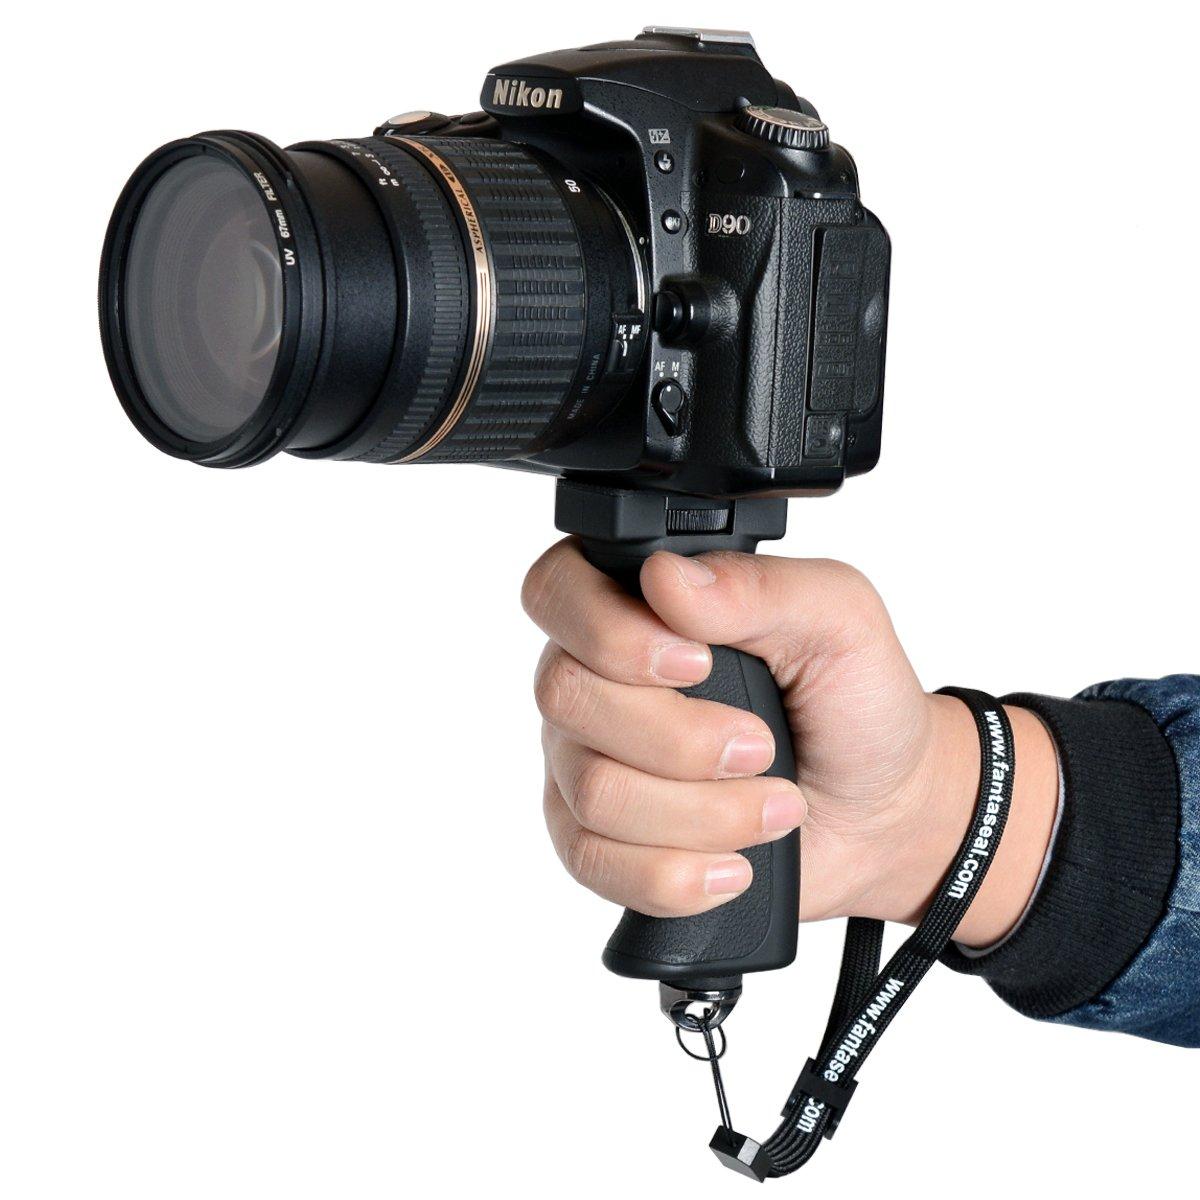 Fantaseal Action Camera Handheld Stabilizer Holder Ricoh Strap St 3 W Photo